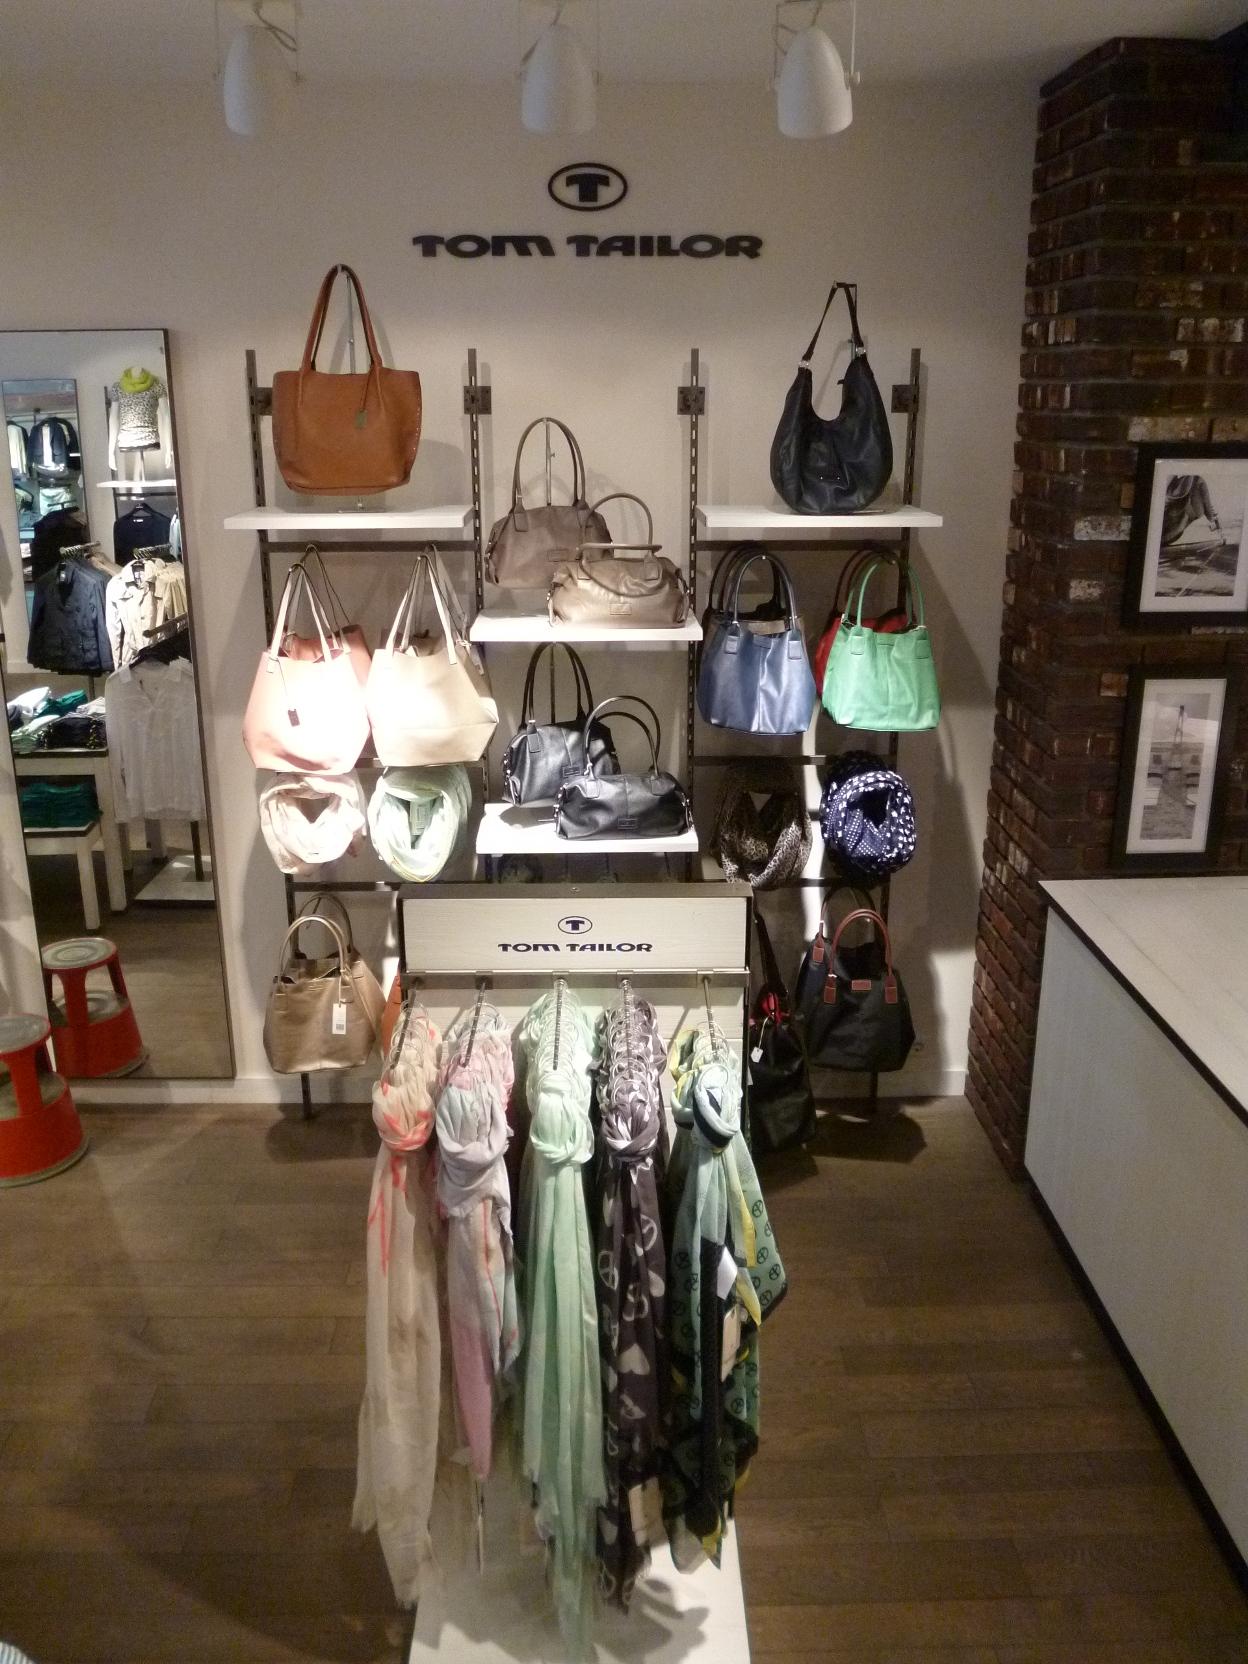 TOM TAILOR Store, Holstenstrasse 80-82 in Kiel